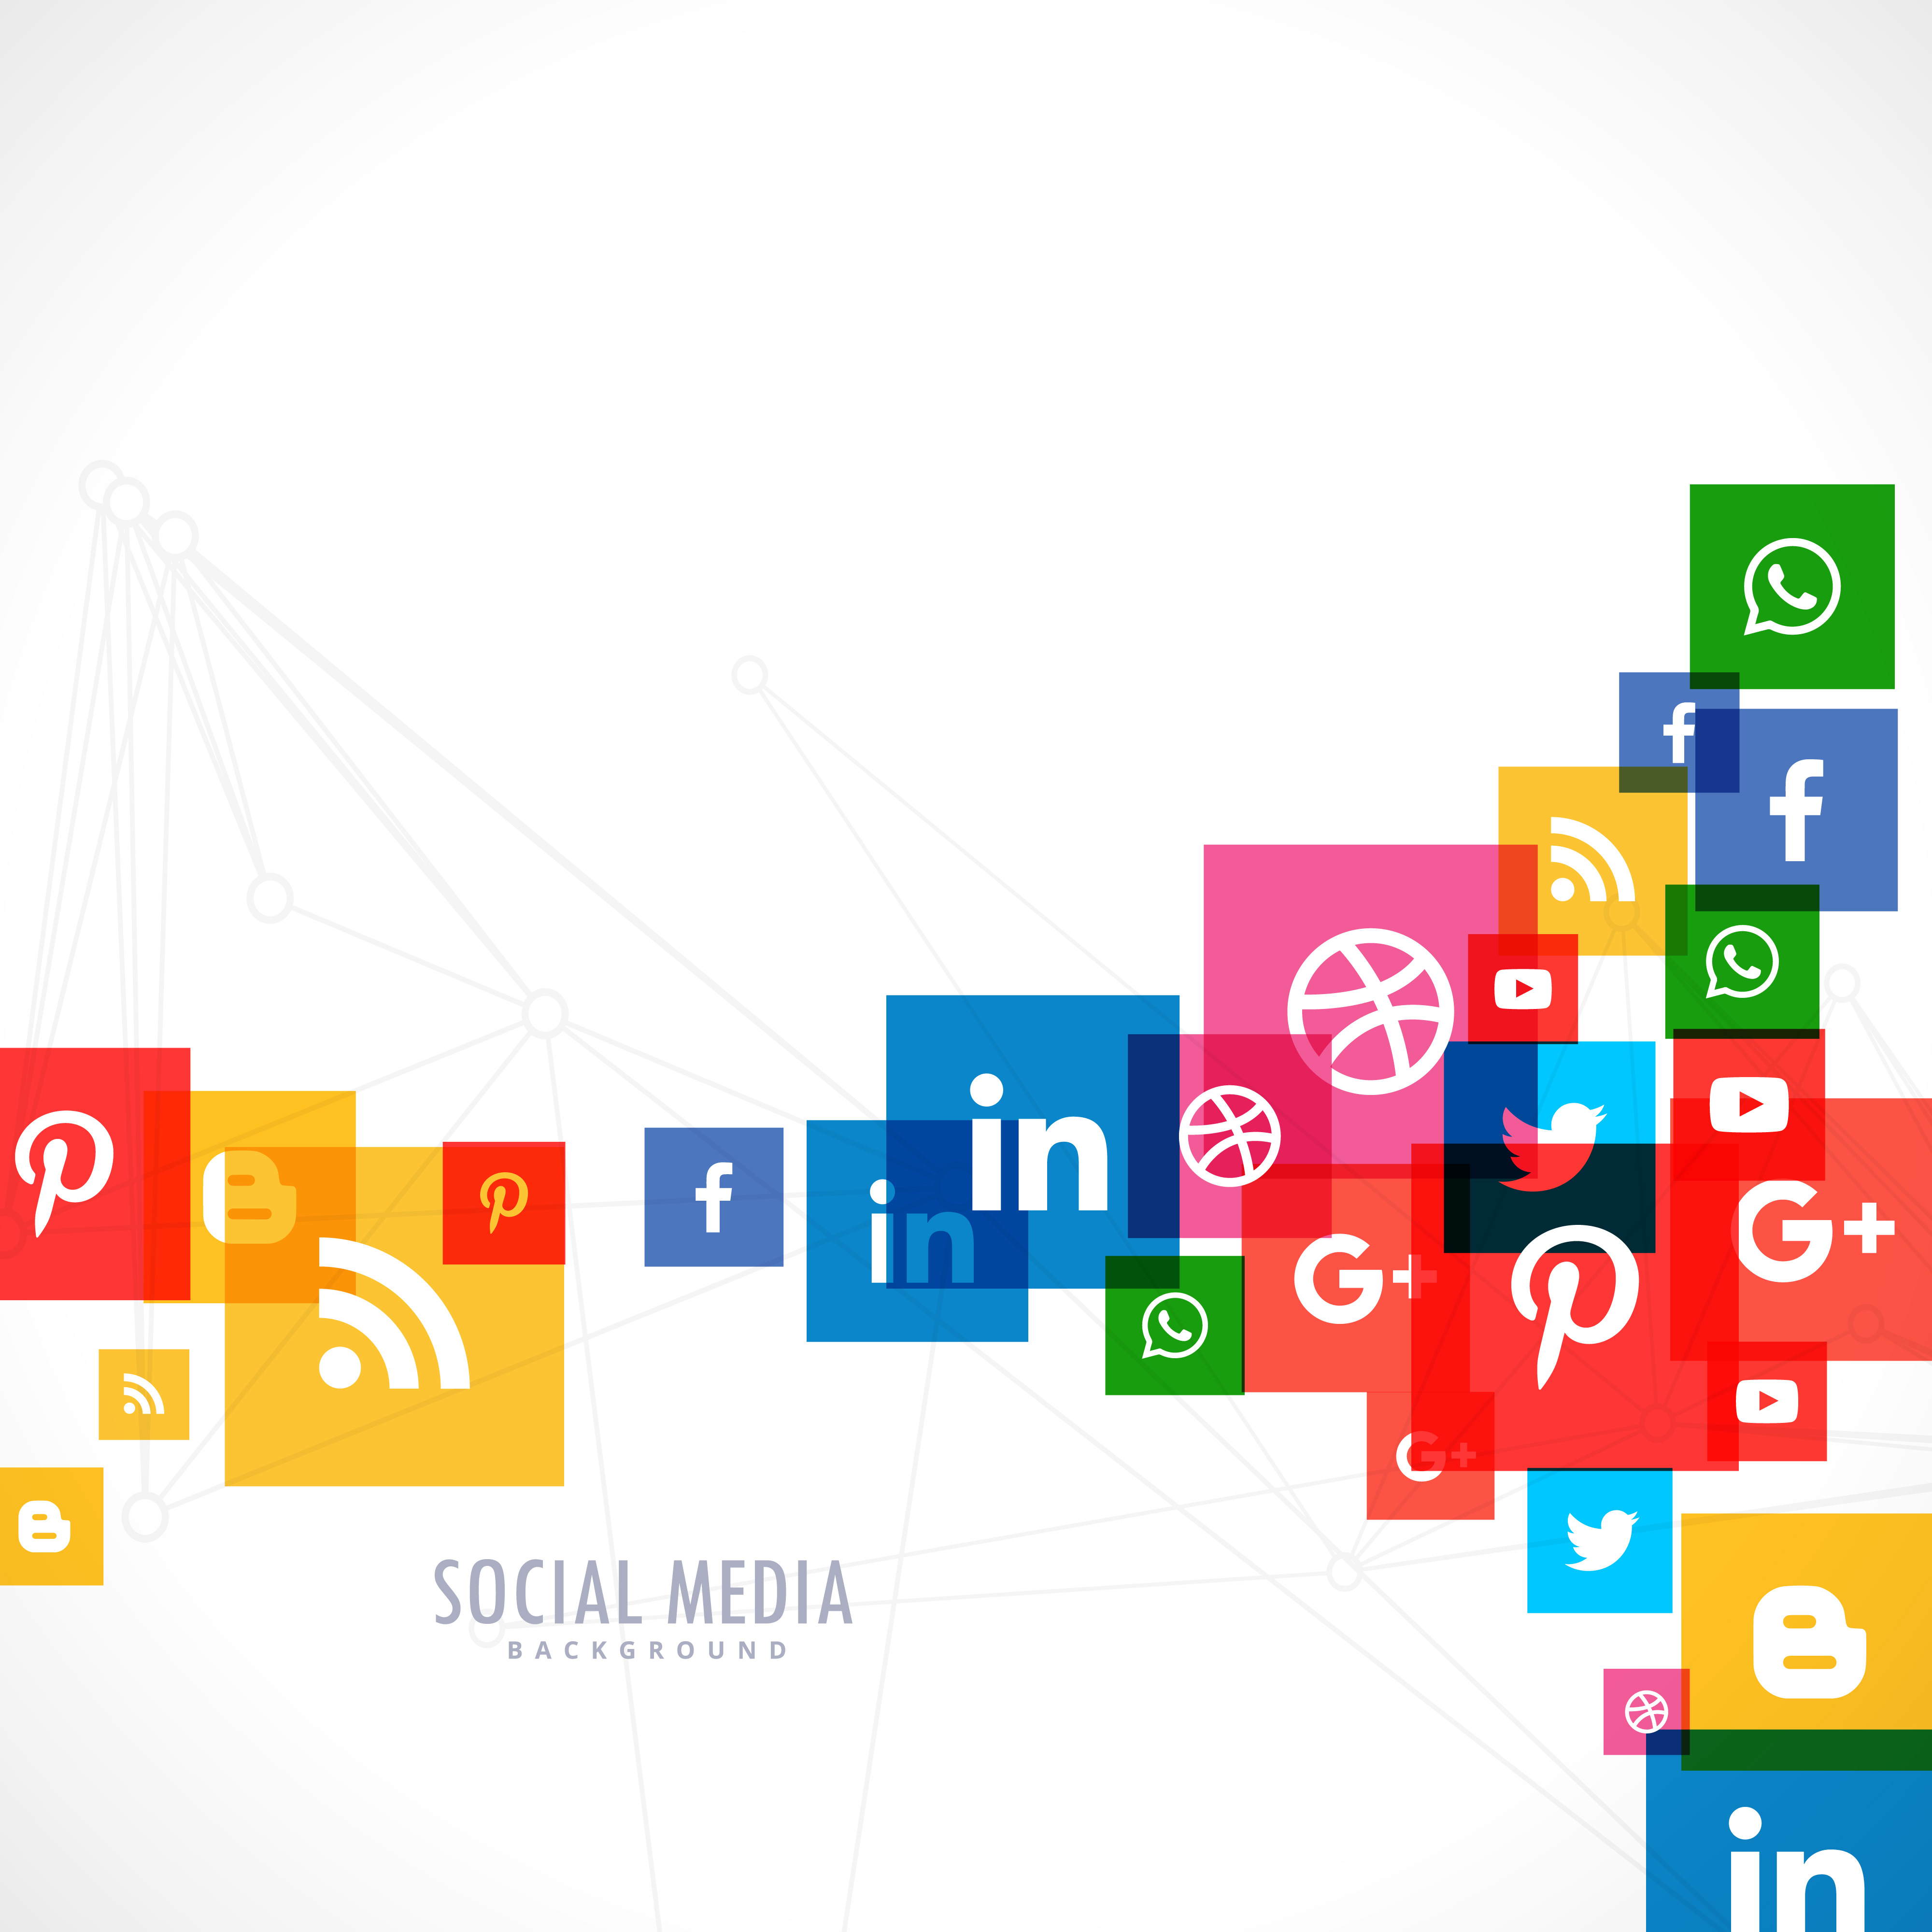 vector-social-media-icons-background.jpg